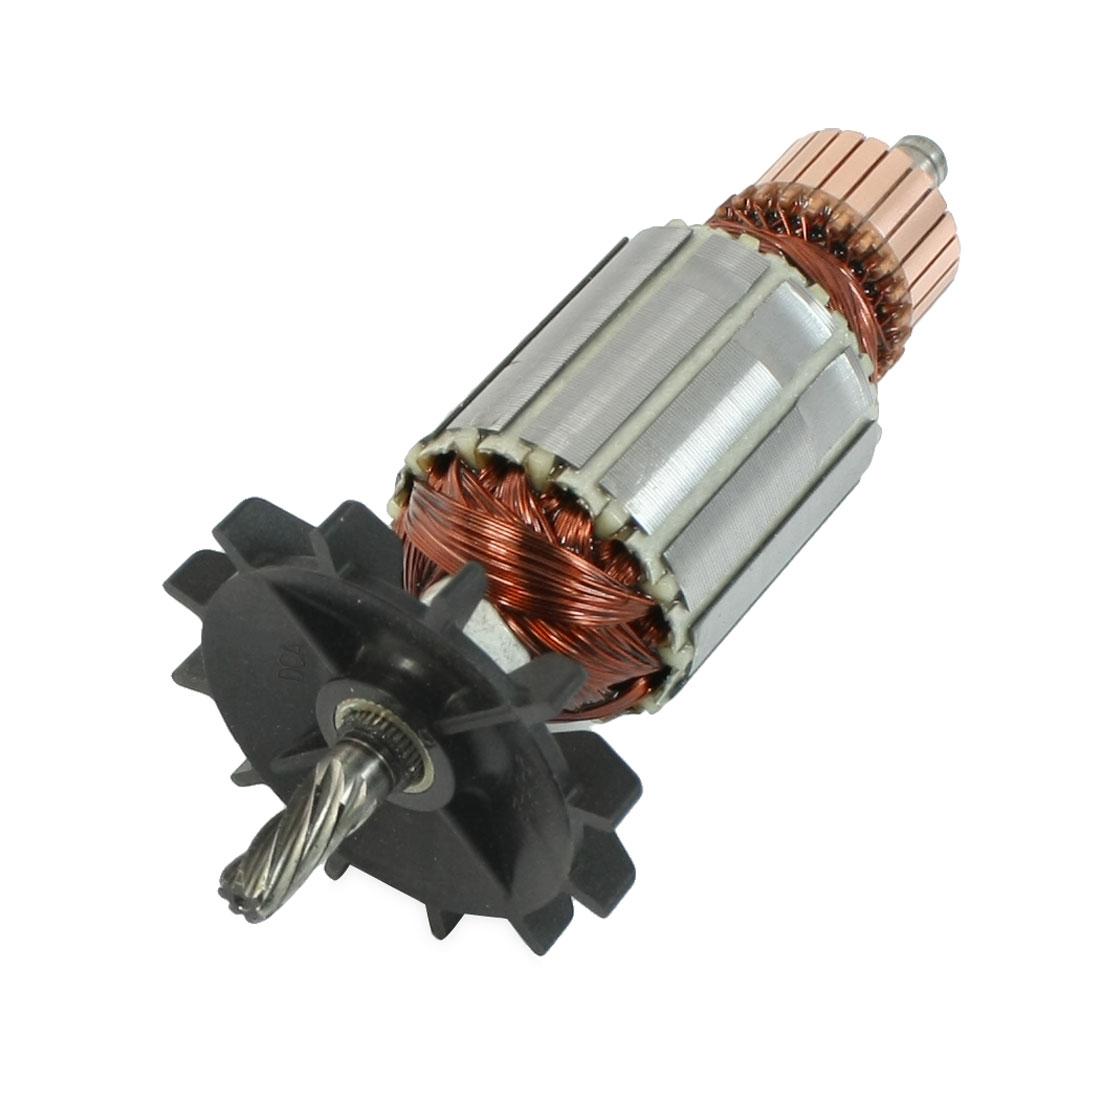 AC220V Power Tool 7 Teeth Drive Shaft Rotor for Makita 6013BR Impact Drill